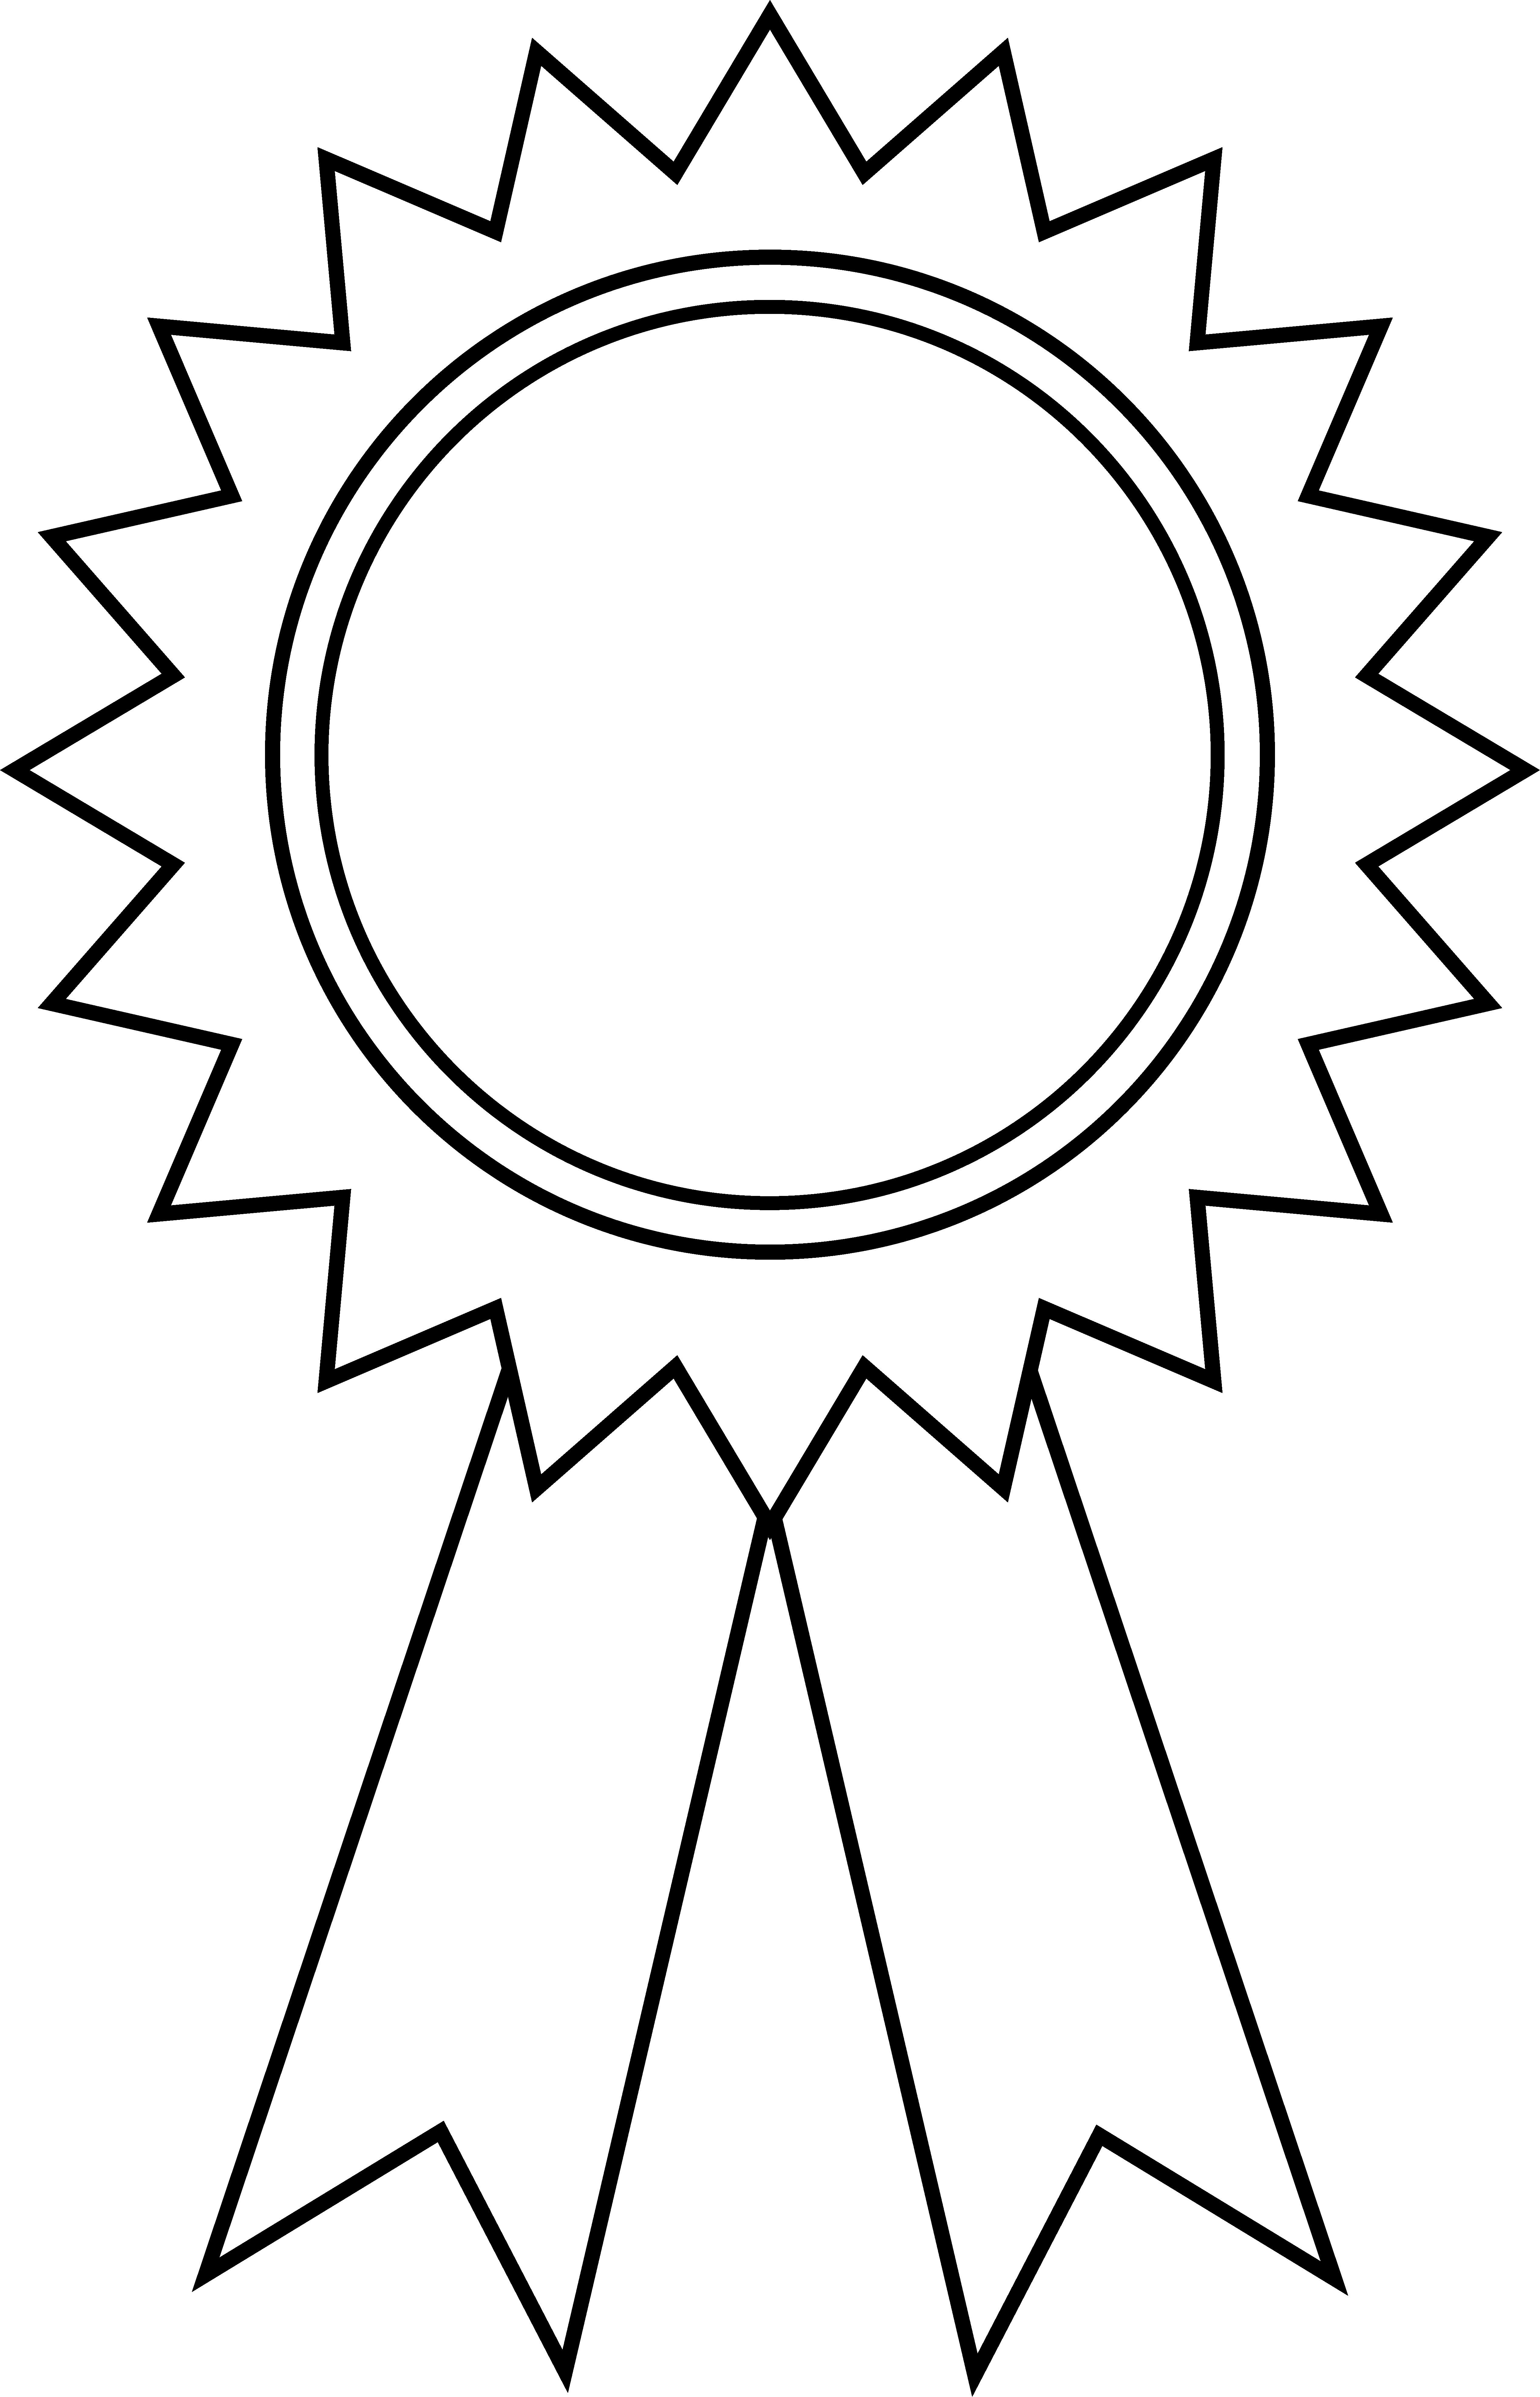 Award certificate template black. Awards clipart printable